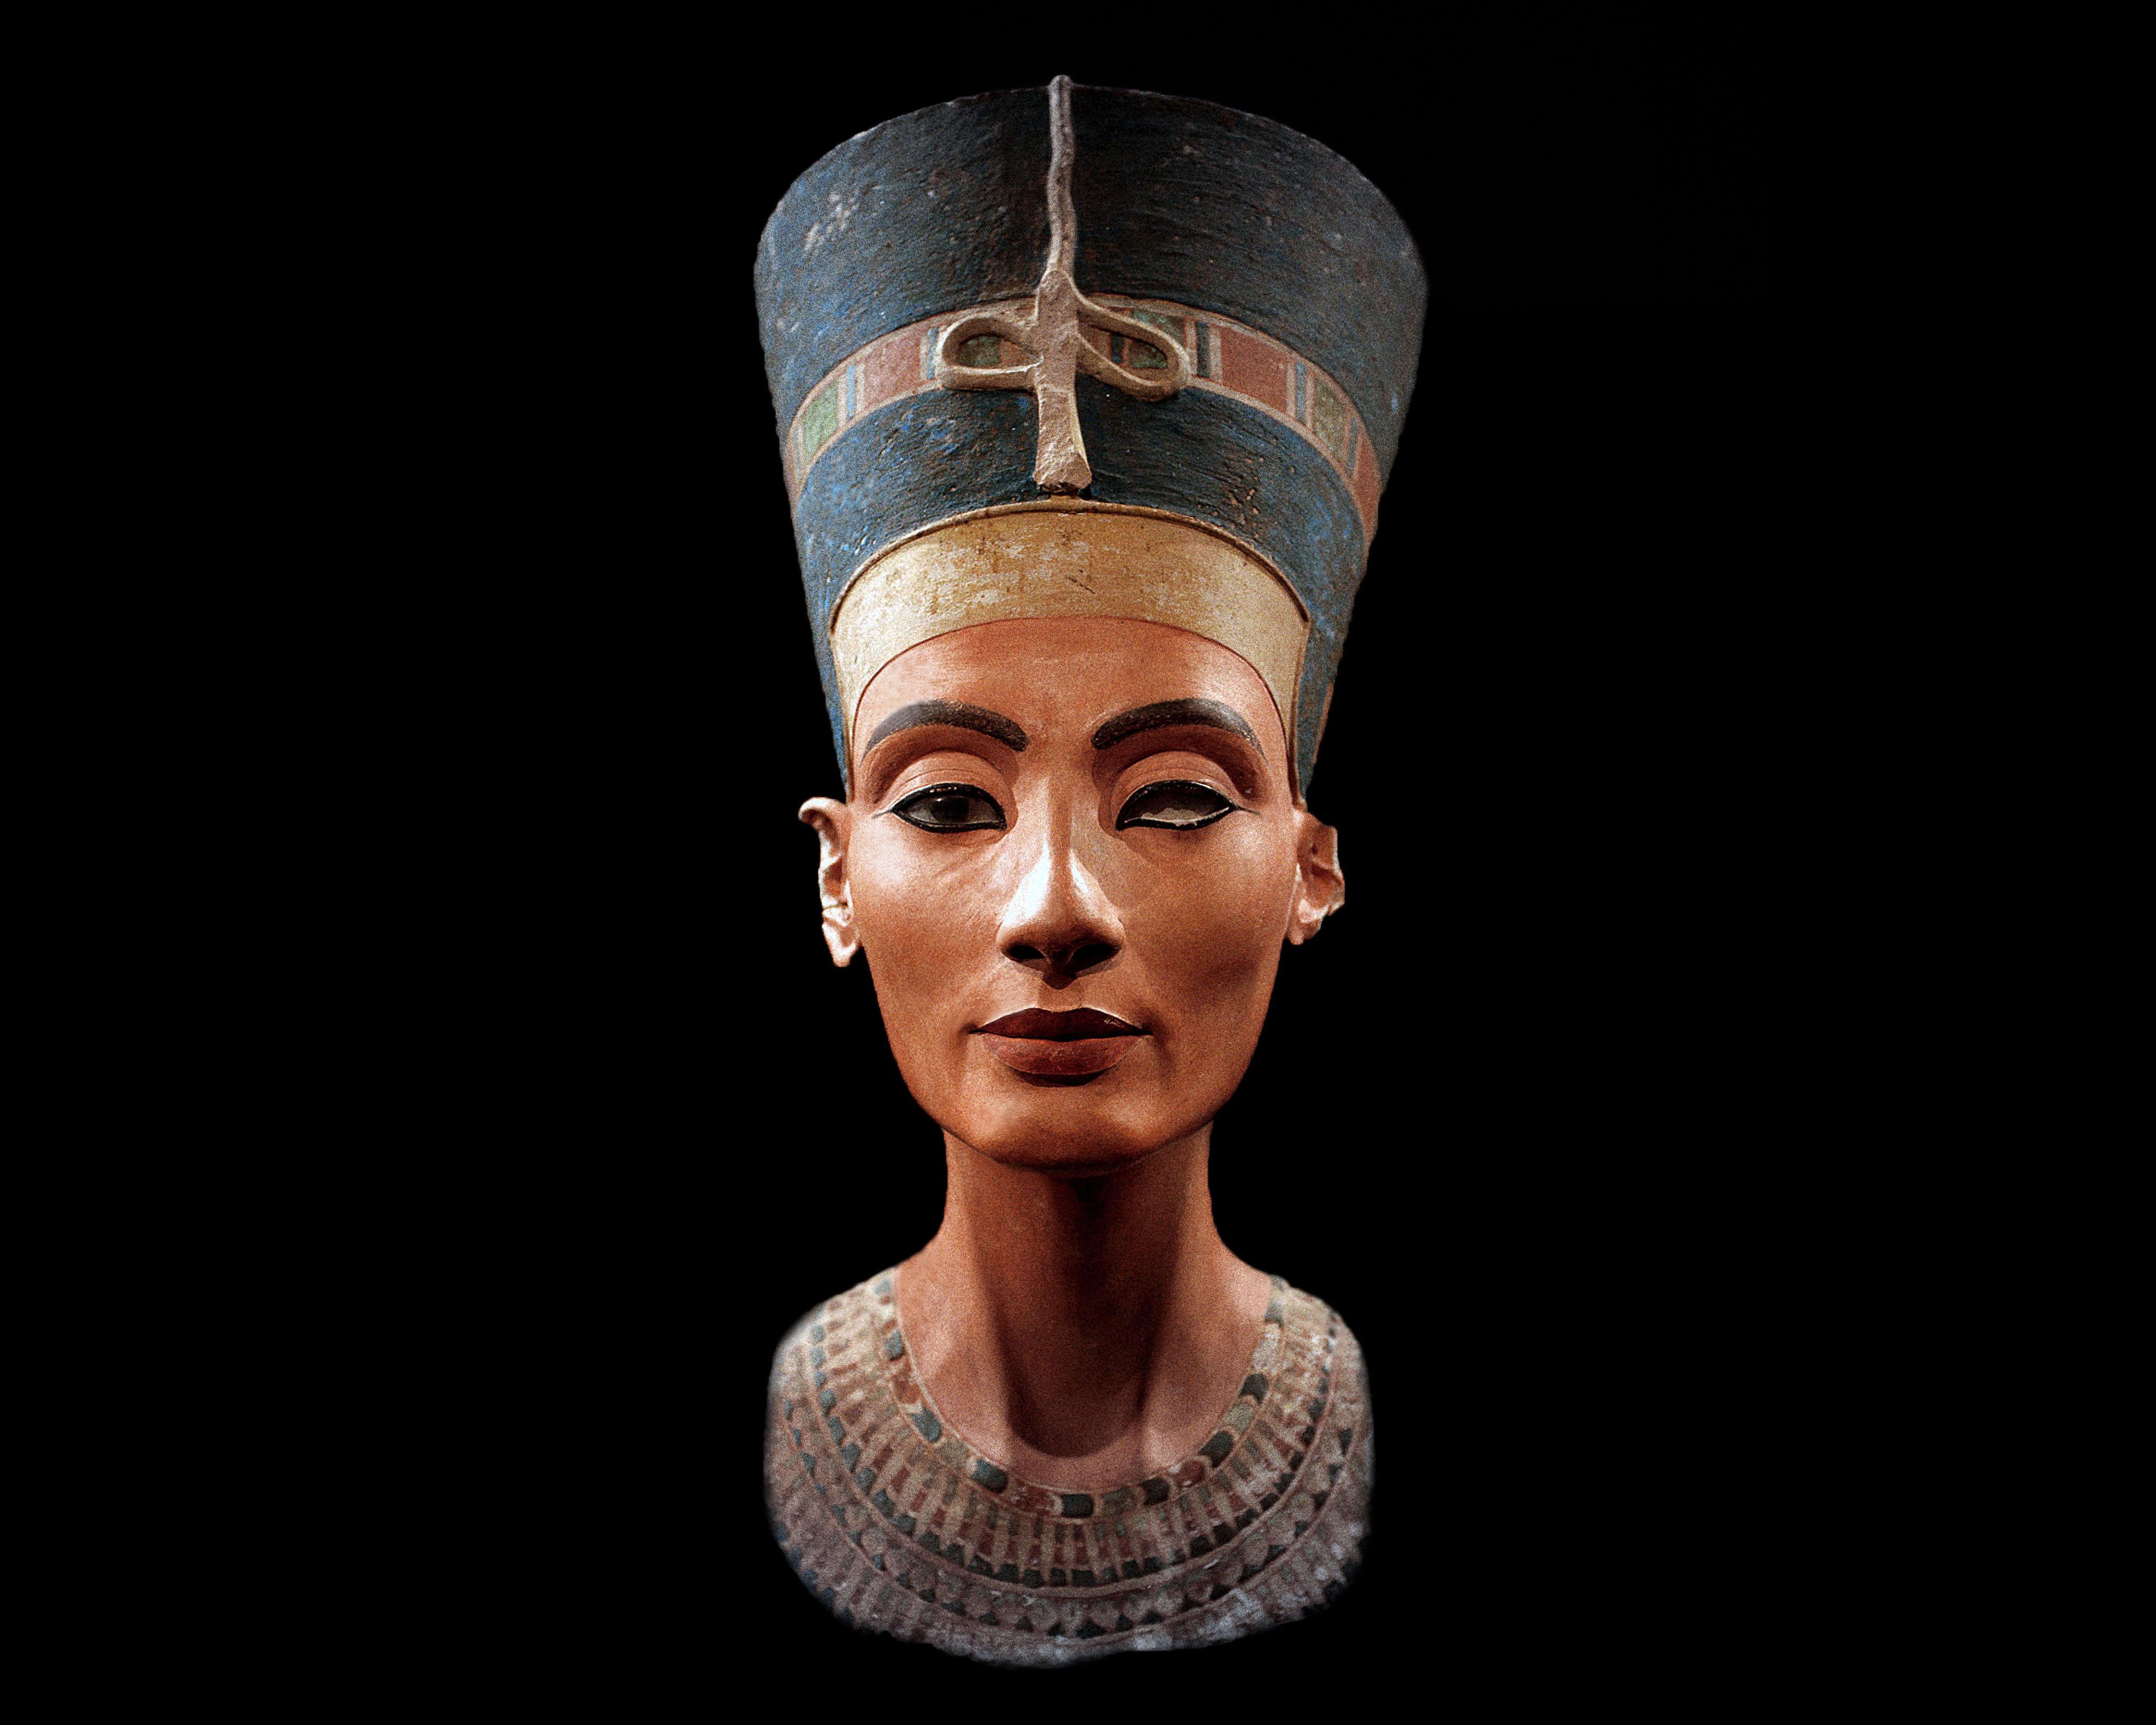 Queen Nefertiti. (Credit: Photo12/UIG/Getty Images)